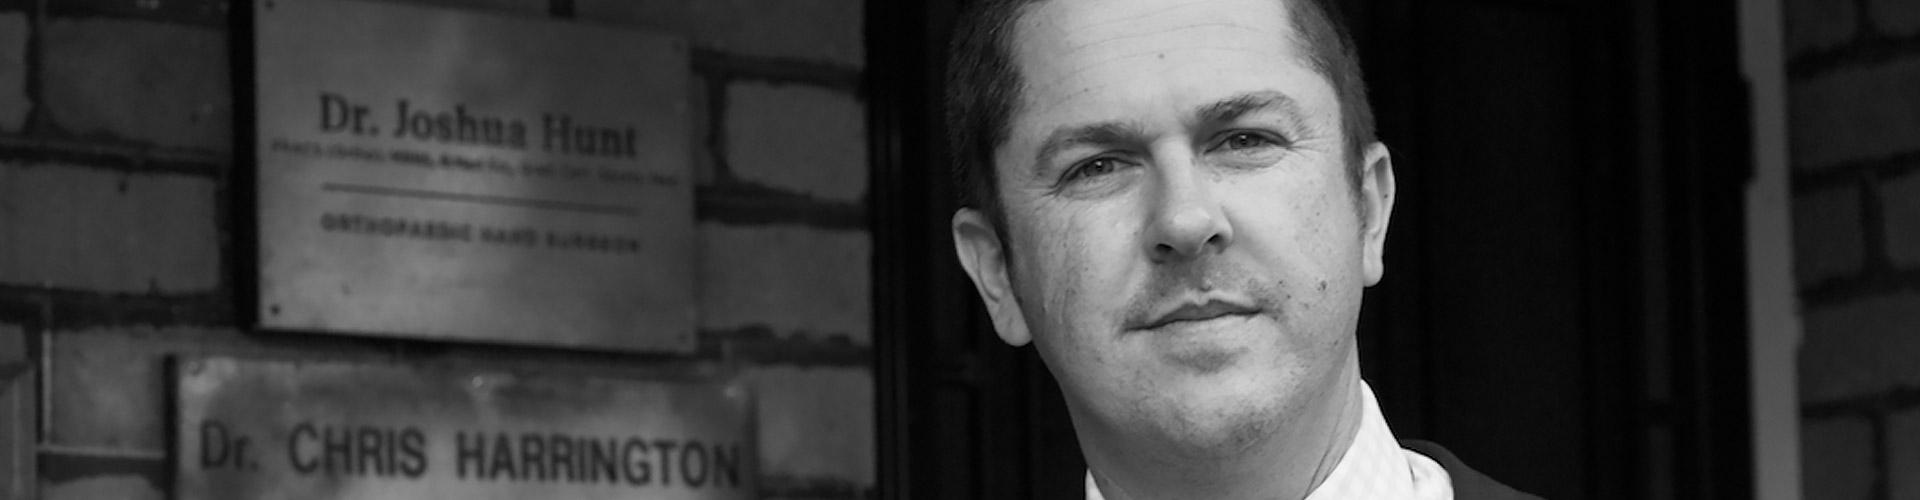 Dr Josh Hunt - Hand Surgeon, Newcastle - Home Slider 1